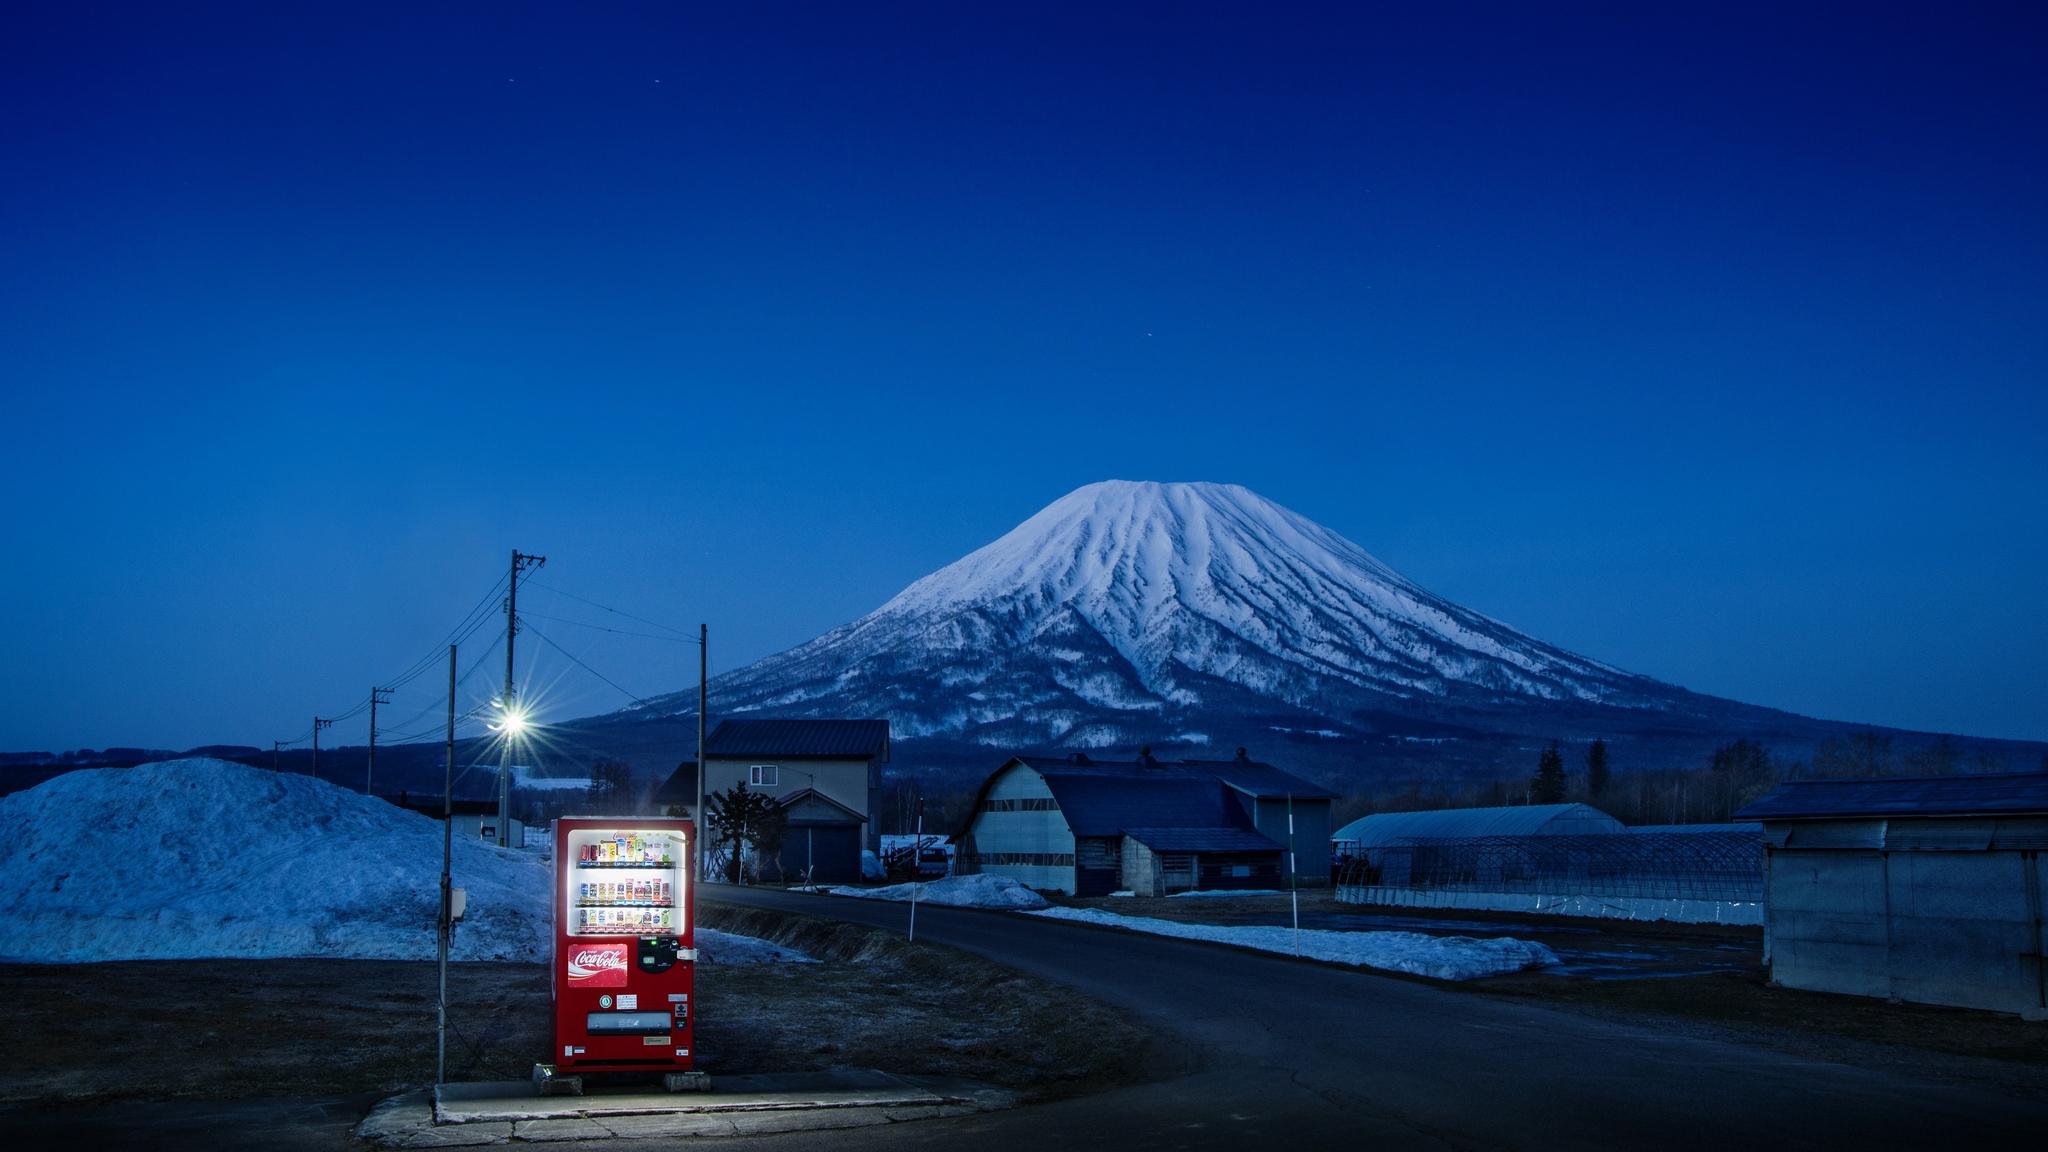 vending-machine-japan-mount-fuji-4k-cx.jpg